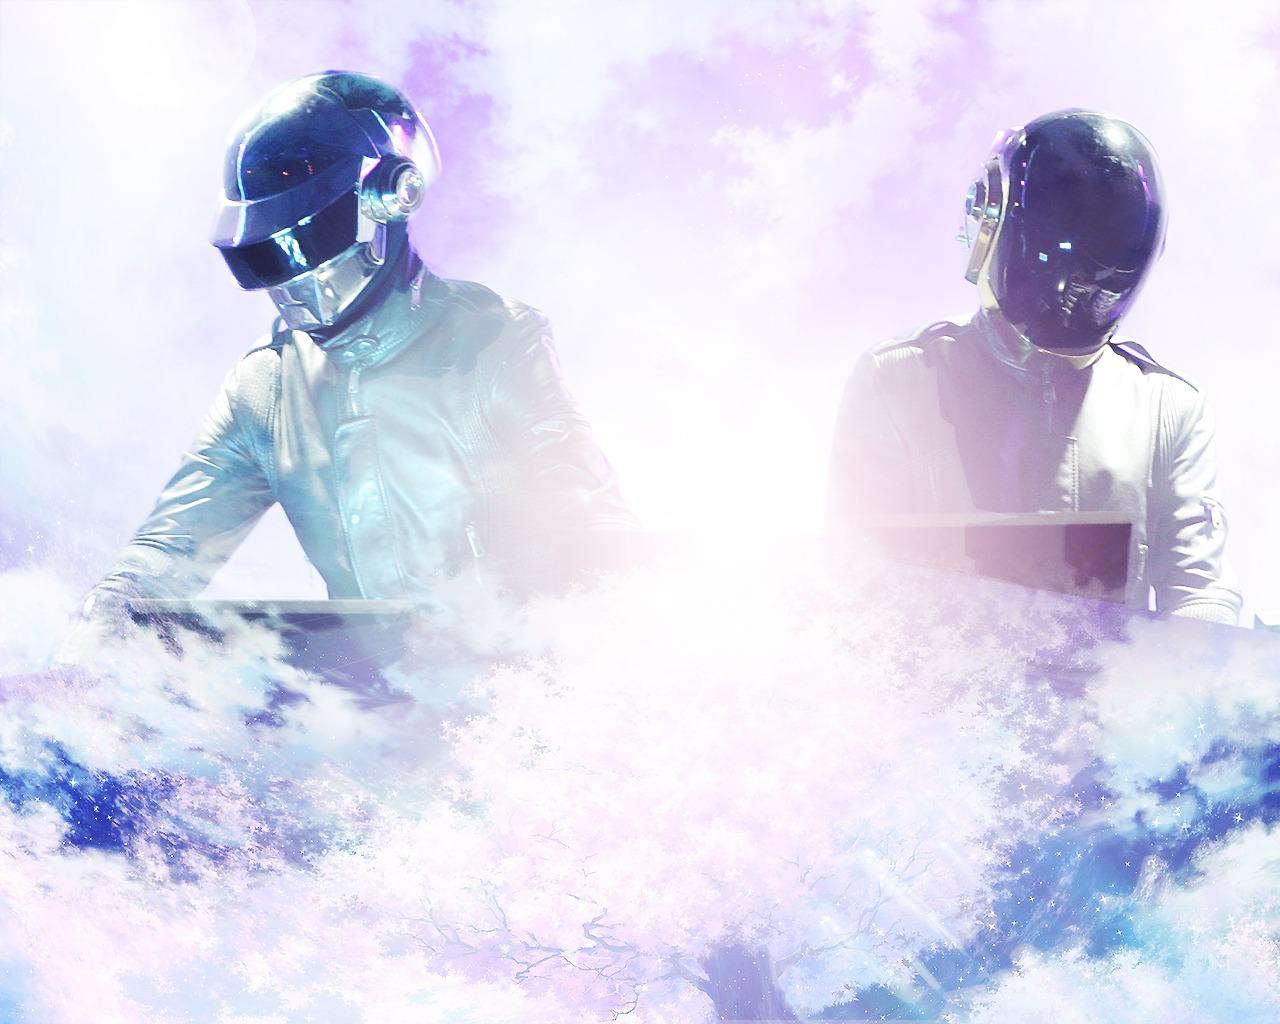 Daft Punk Live wallpaper by Heriorh on DeviantArt